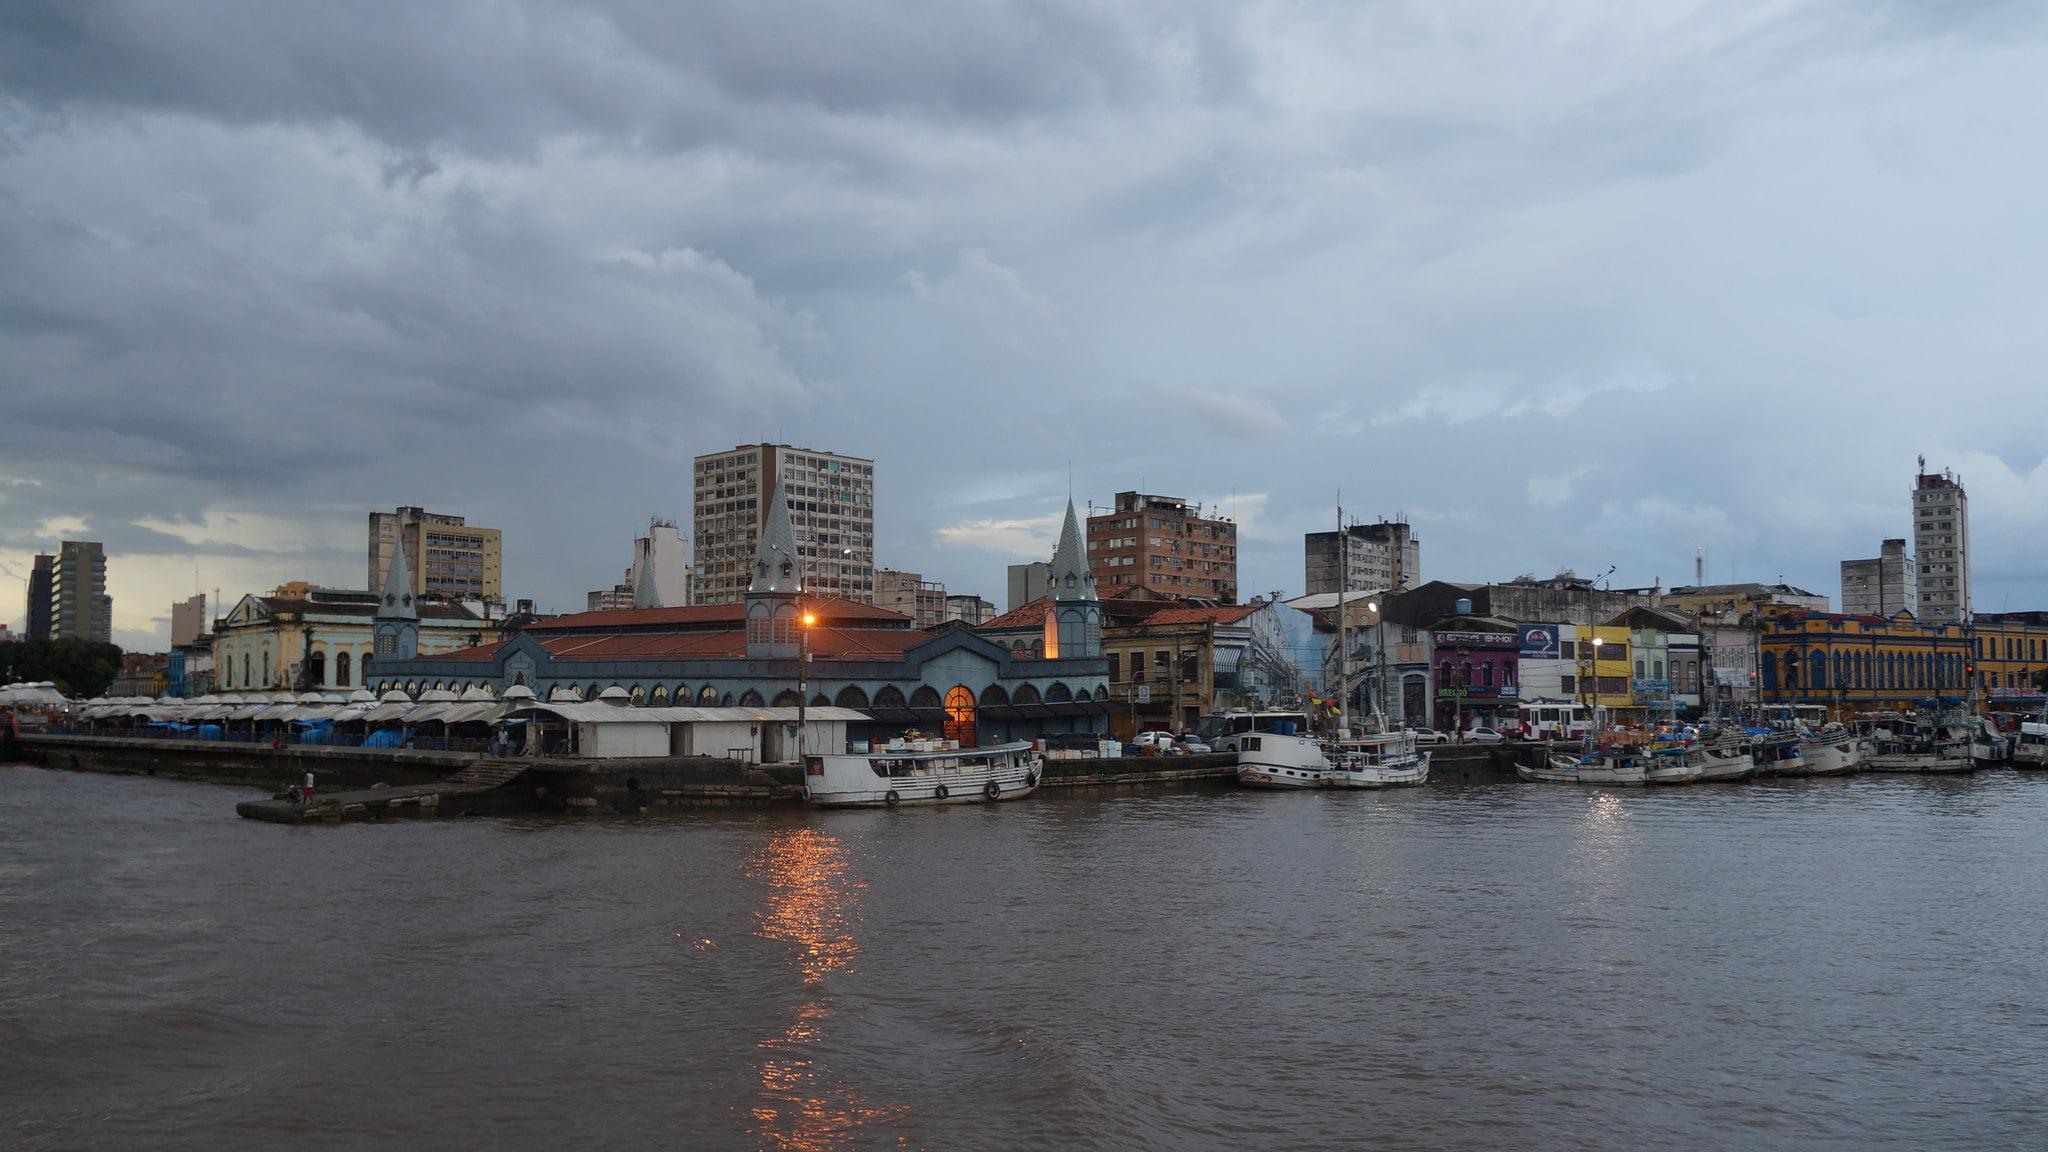 Belém (PA), Brasil - photo by Leandro Neumann Ciuffo under CC BY 2.0